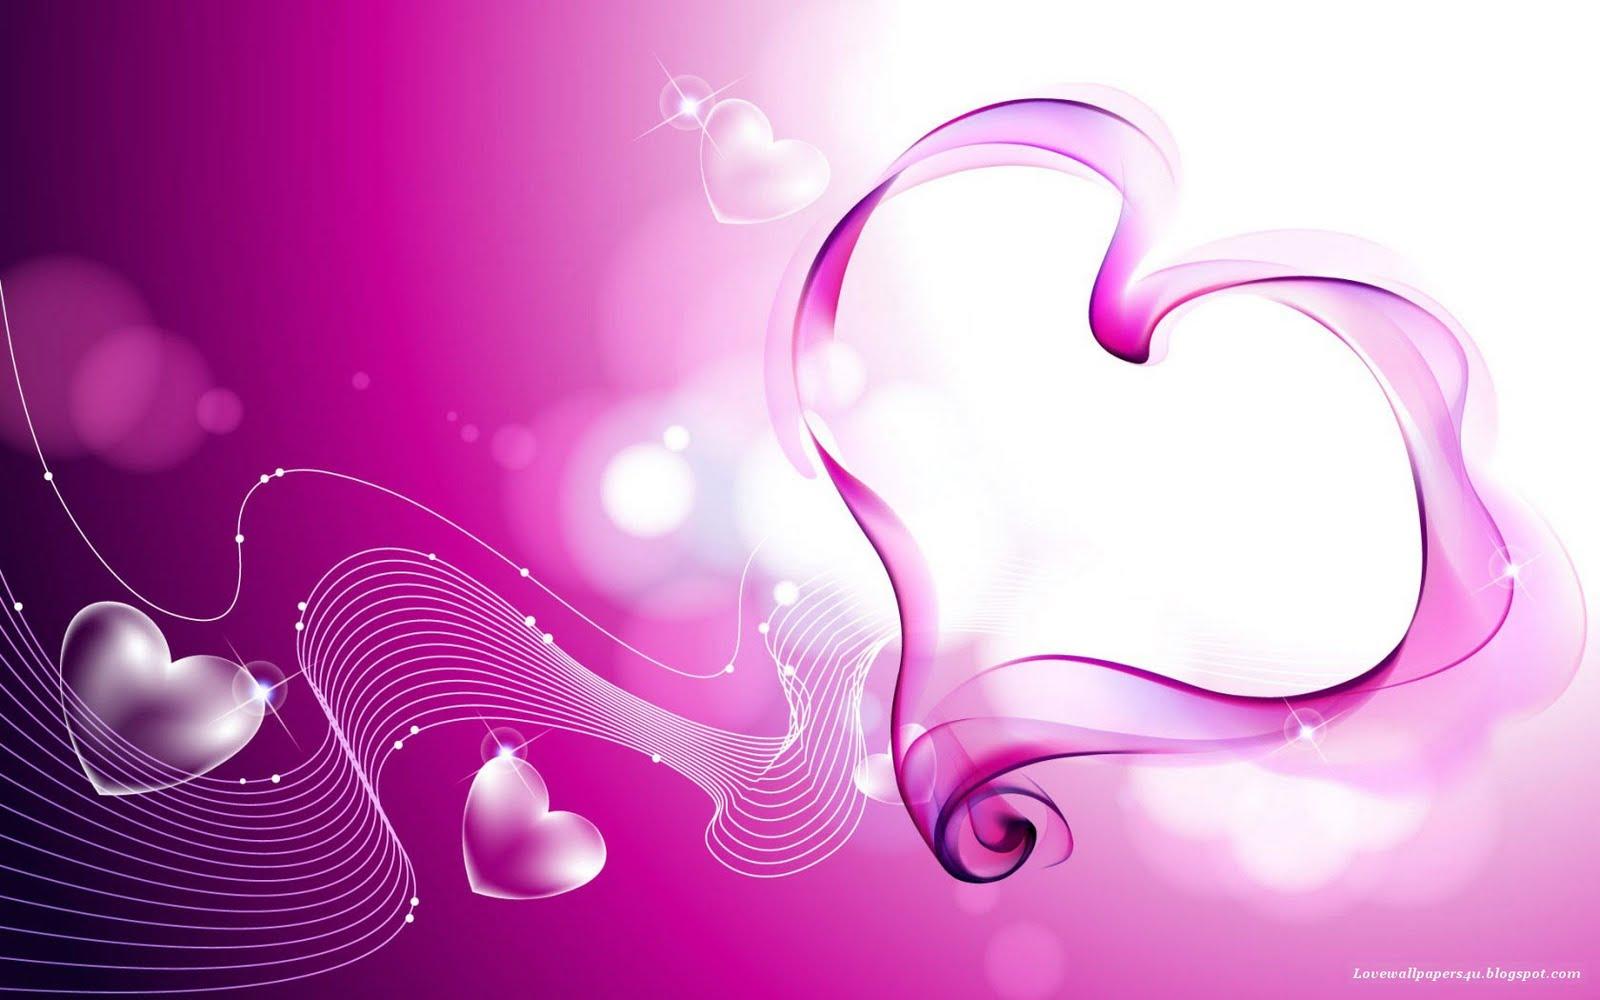 Best Love Wallpapers: The Best Love Wallpapers